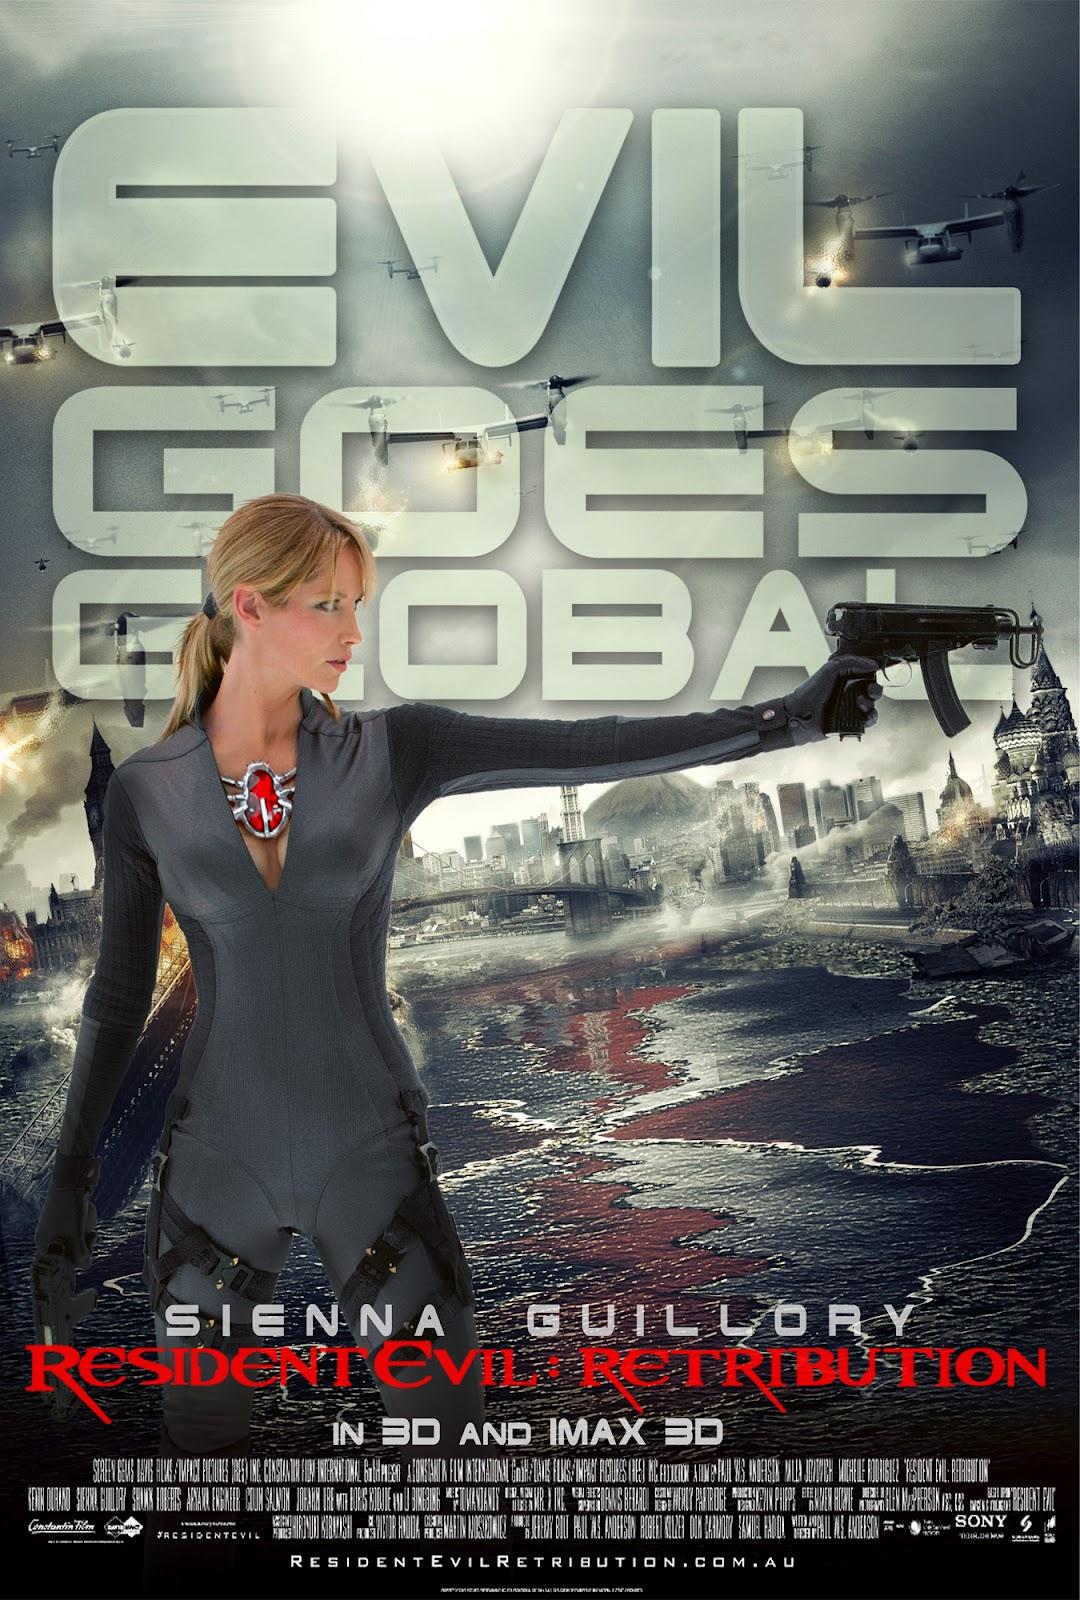 http://4.bp.blogspot.com/-fozmYZ83VTQ/UFJDO5TkU1I/AAAAAAAA9tk/hYm-rss4qF8/s1600/Resident_Evil-Retribution-Sienna_Guillory-Poster.jpg